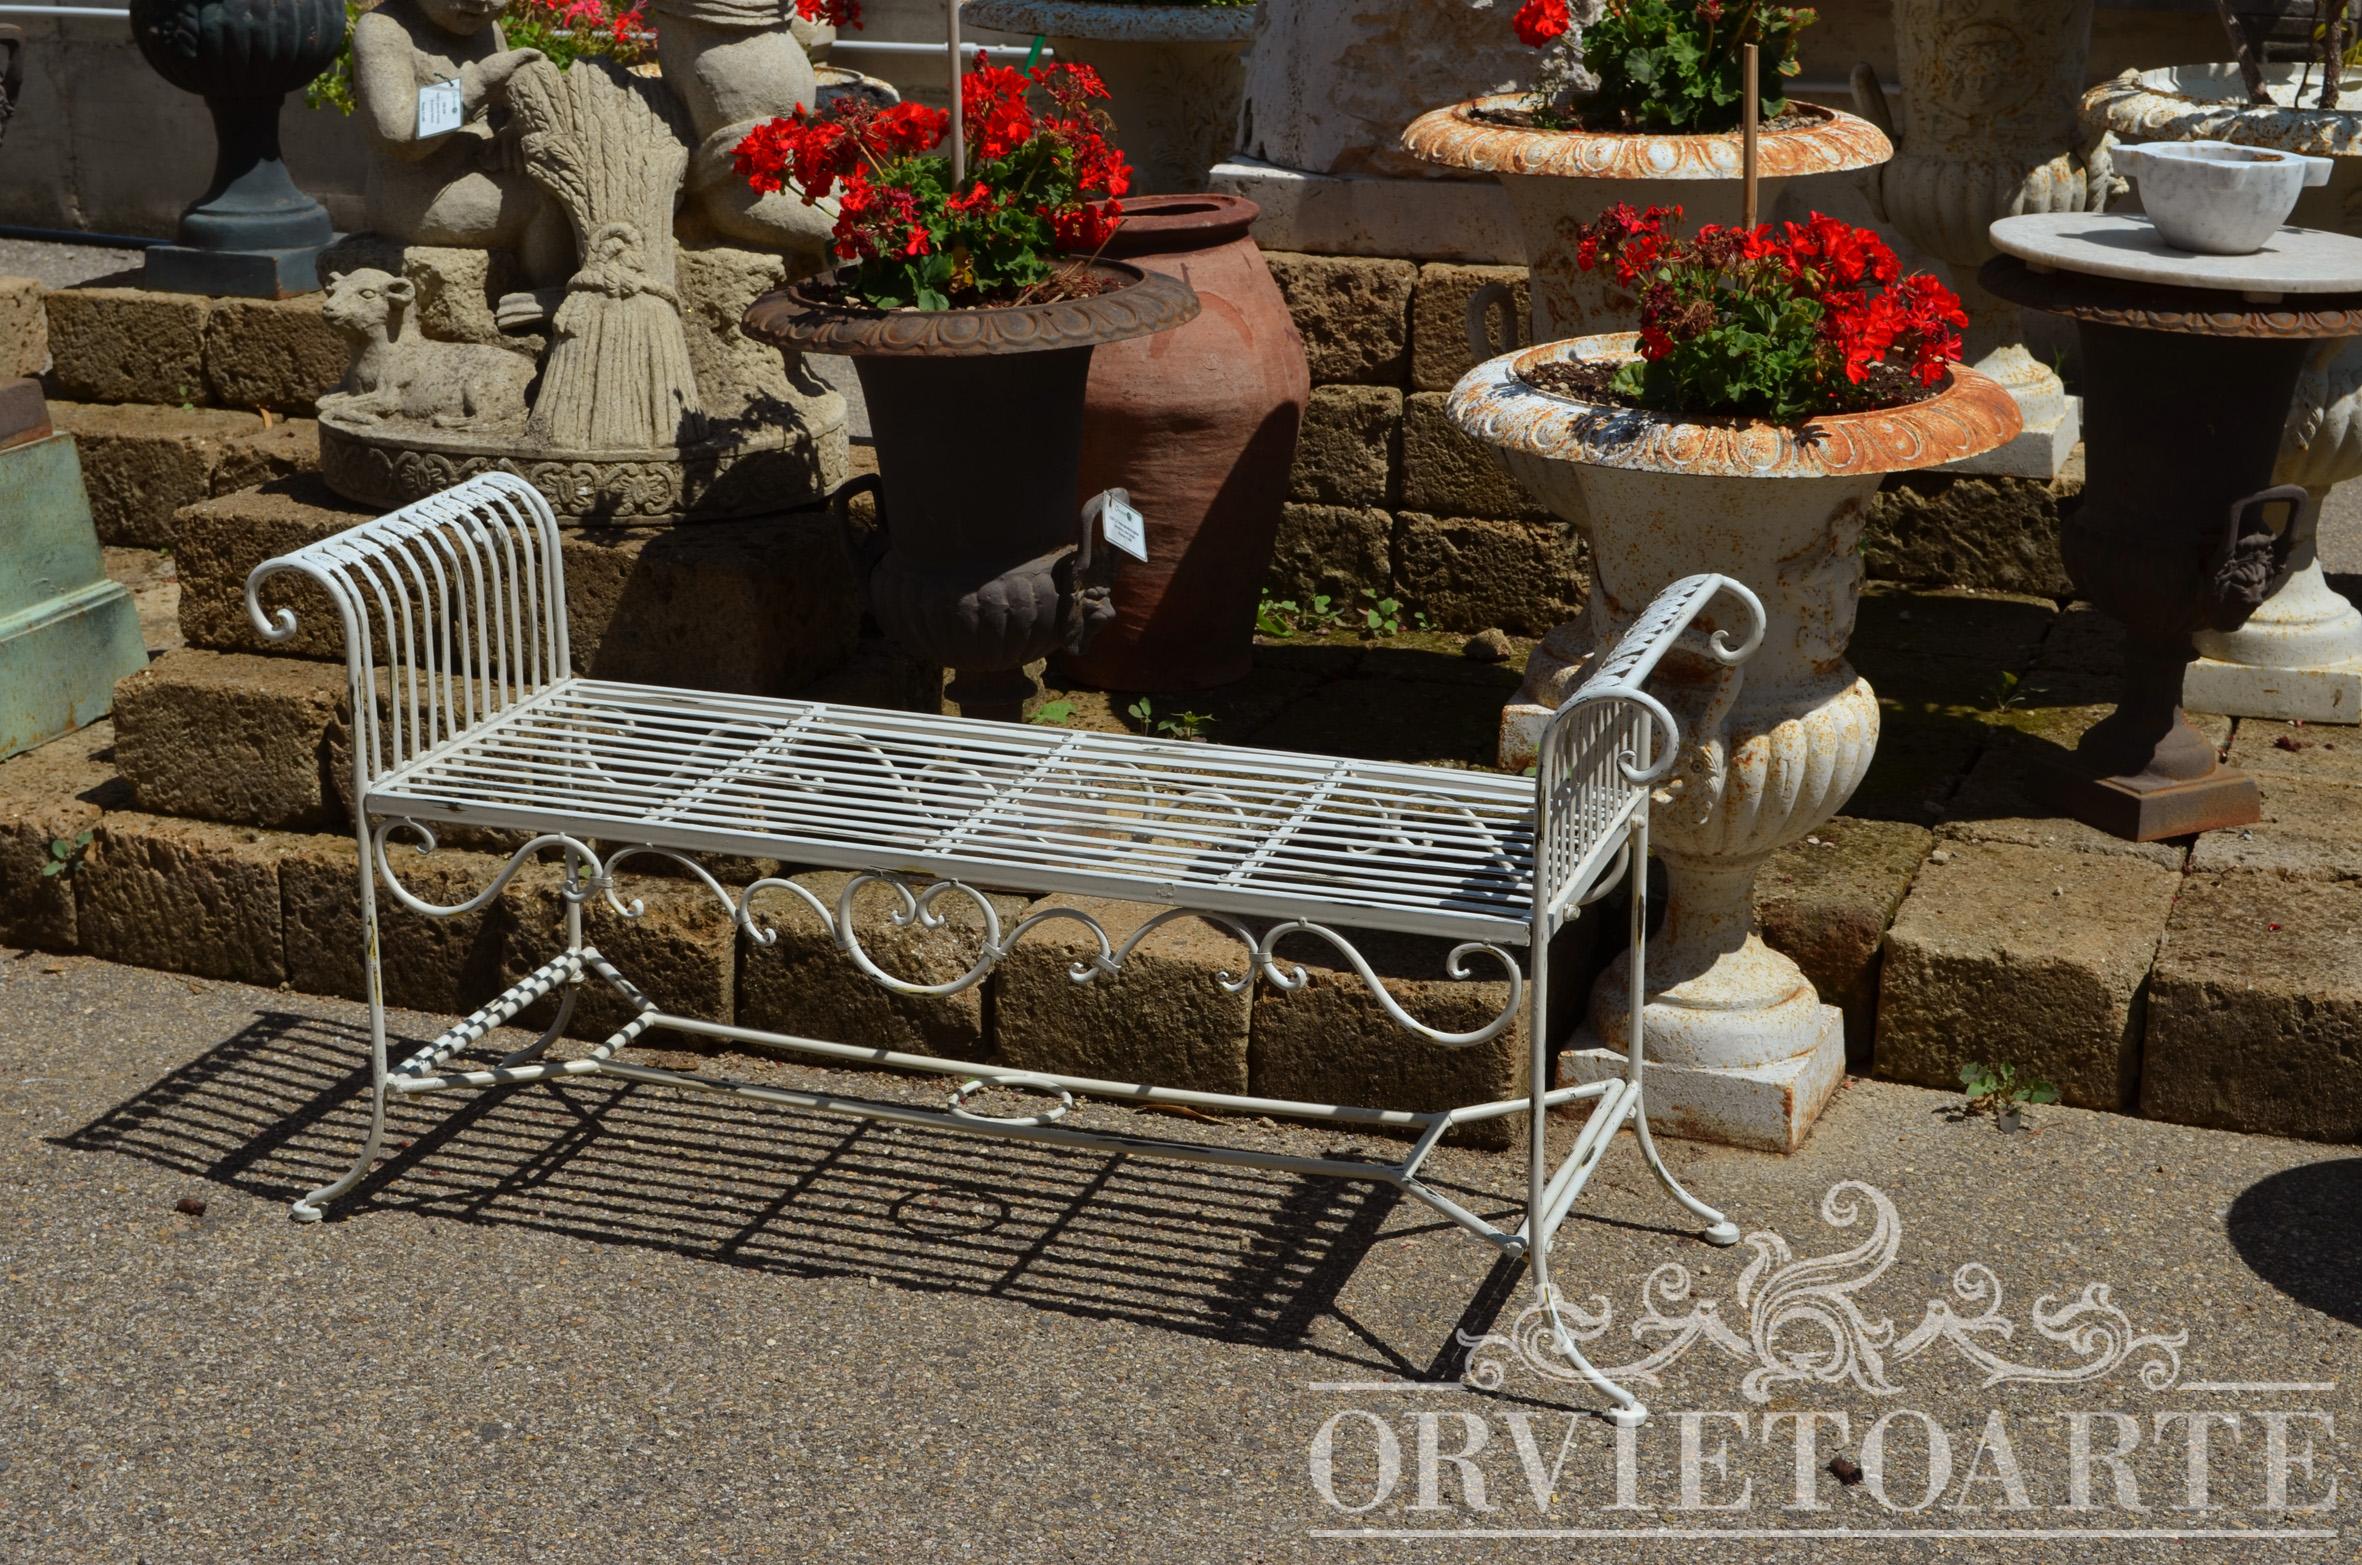 Orvieto arte dormeuse in ferro da giardino for Arredo giardino perugia